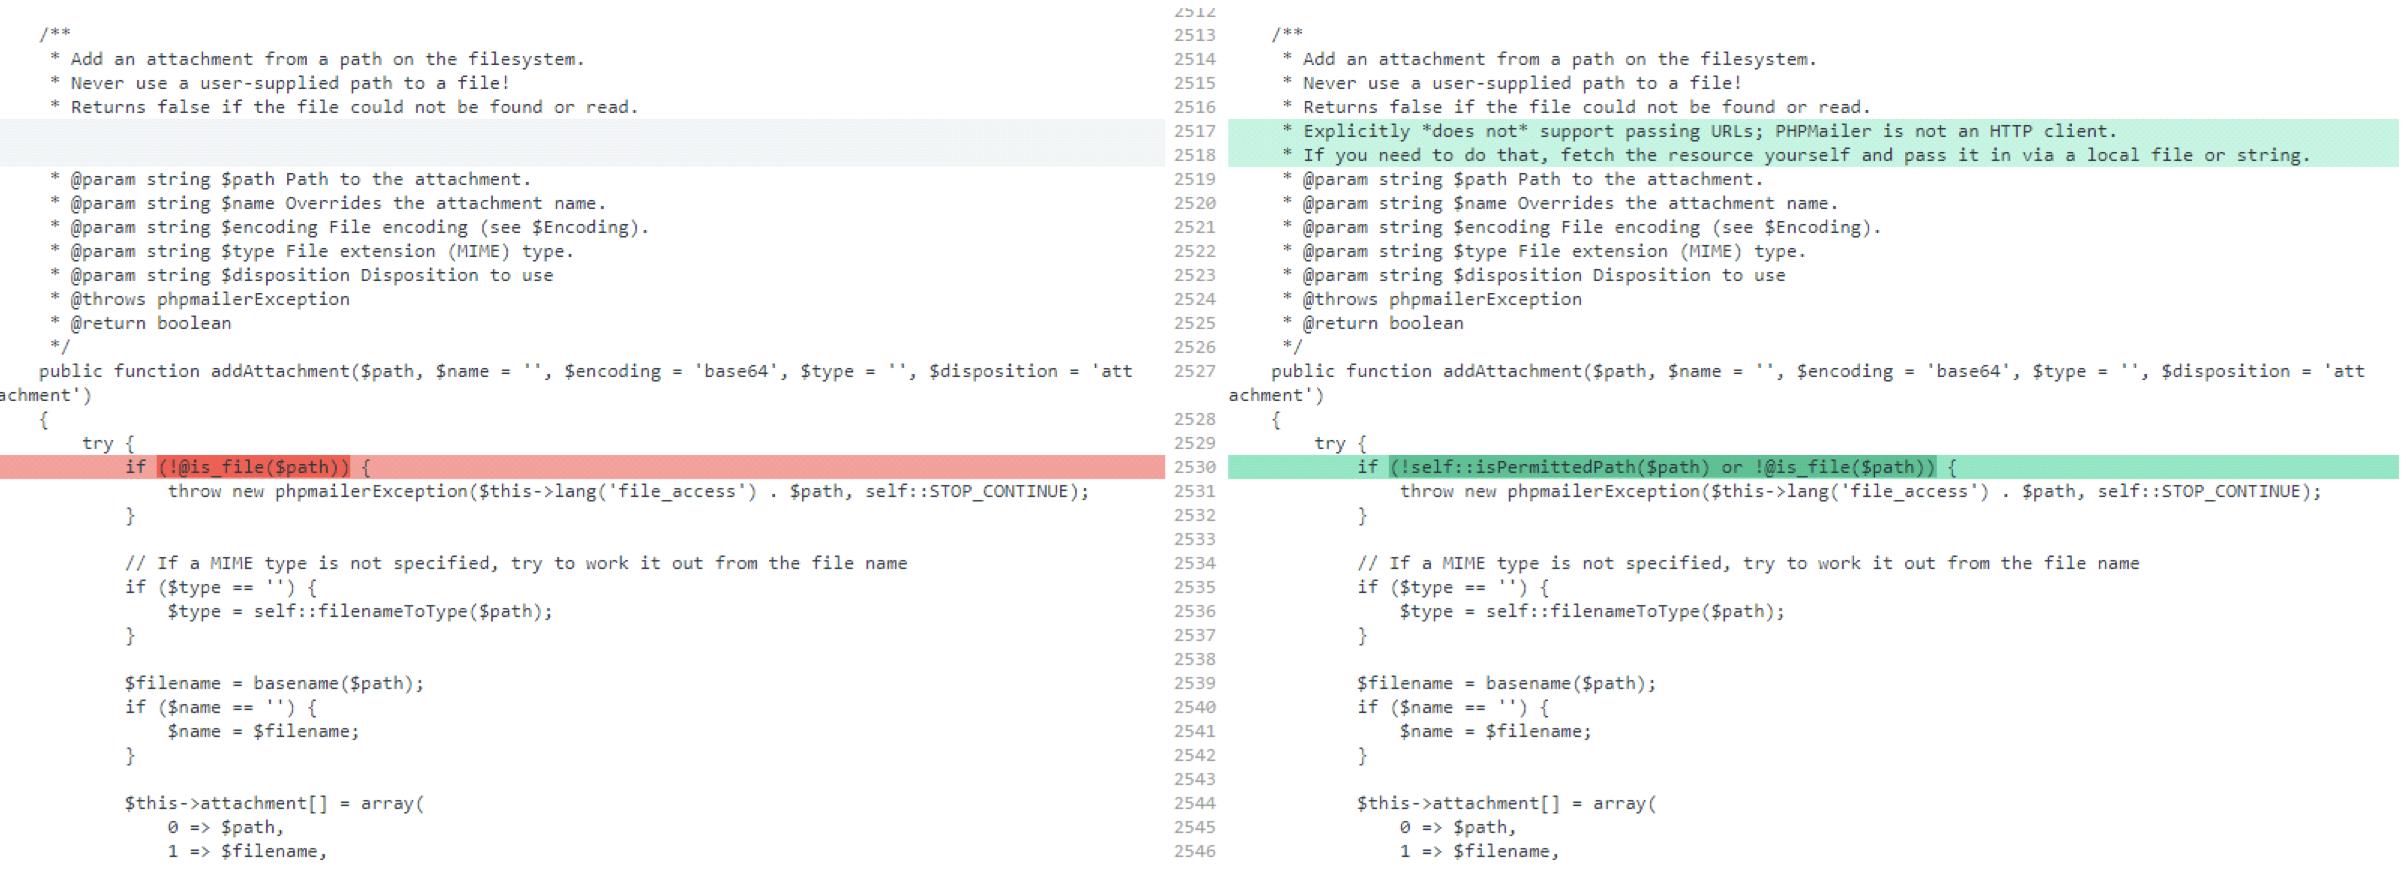 WordPress PHPMailer vulnerability diff